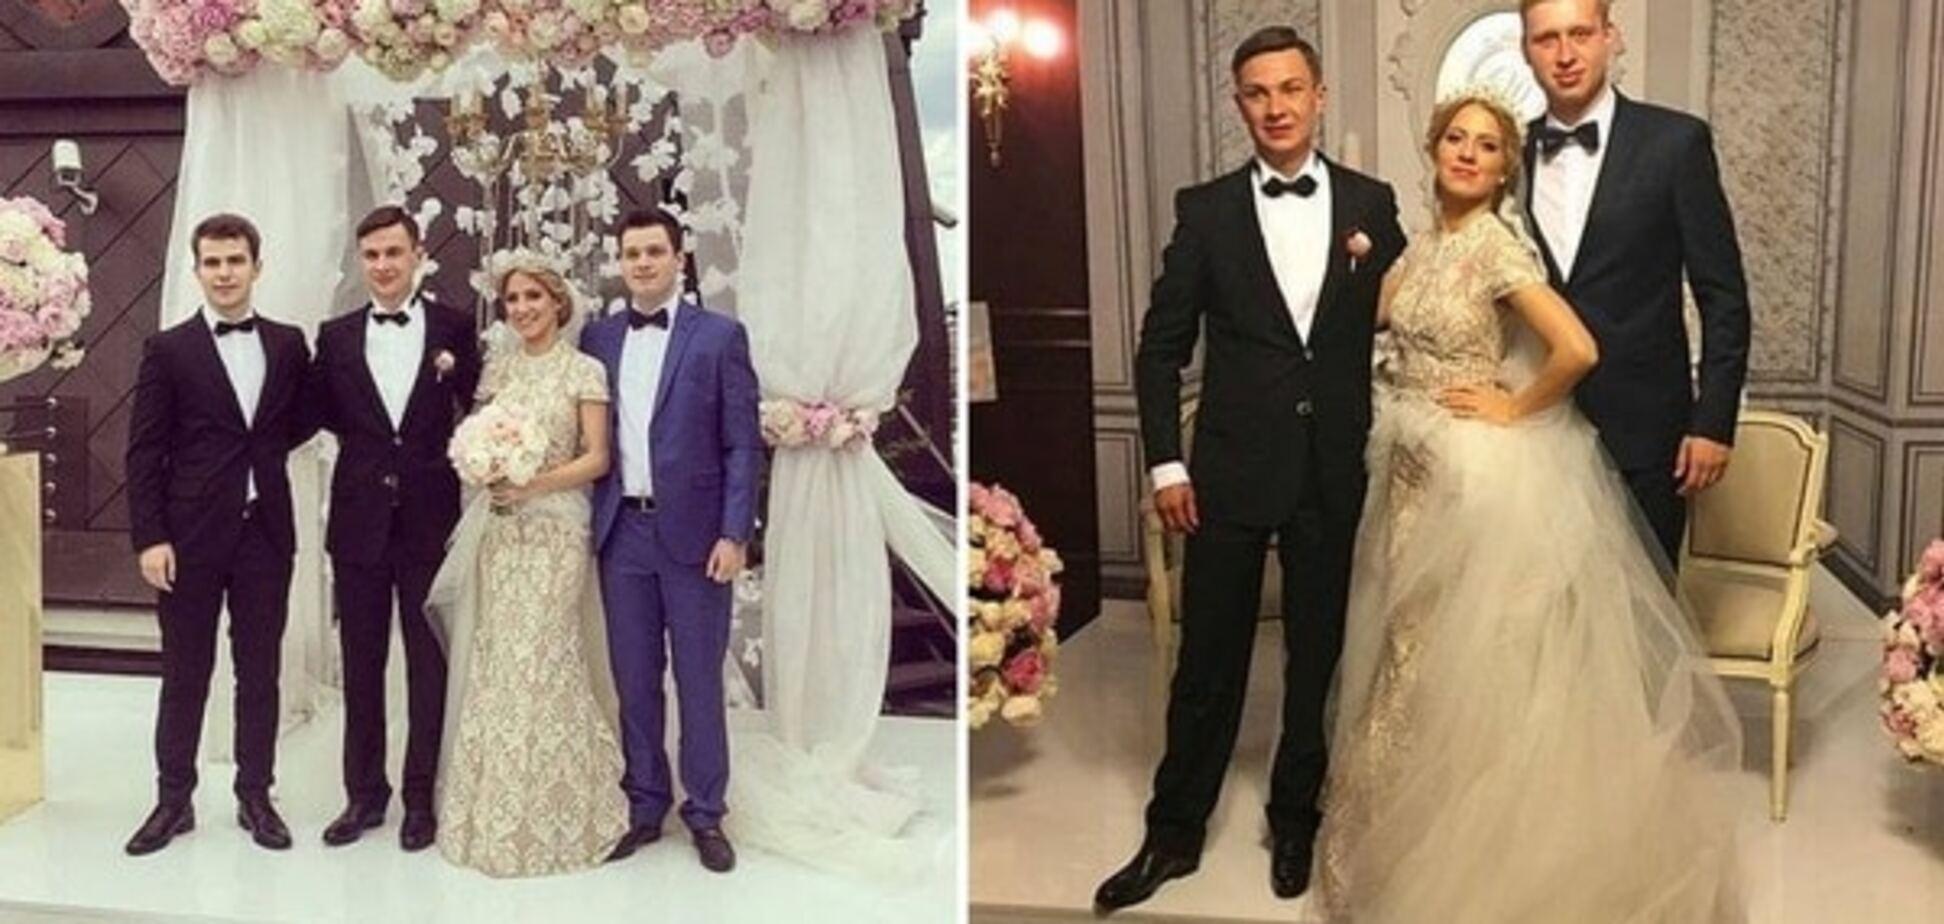 Гелетей-молодший одружився на даху готелю російського олігарха. Джерело: instagram.com